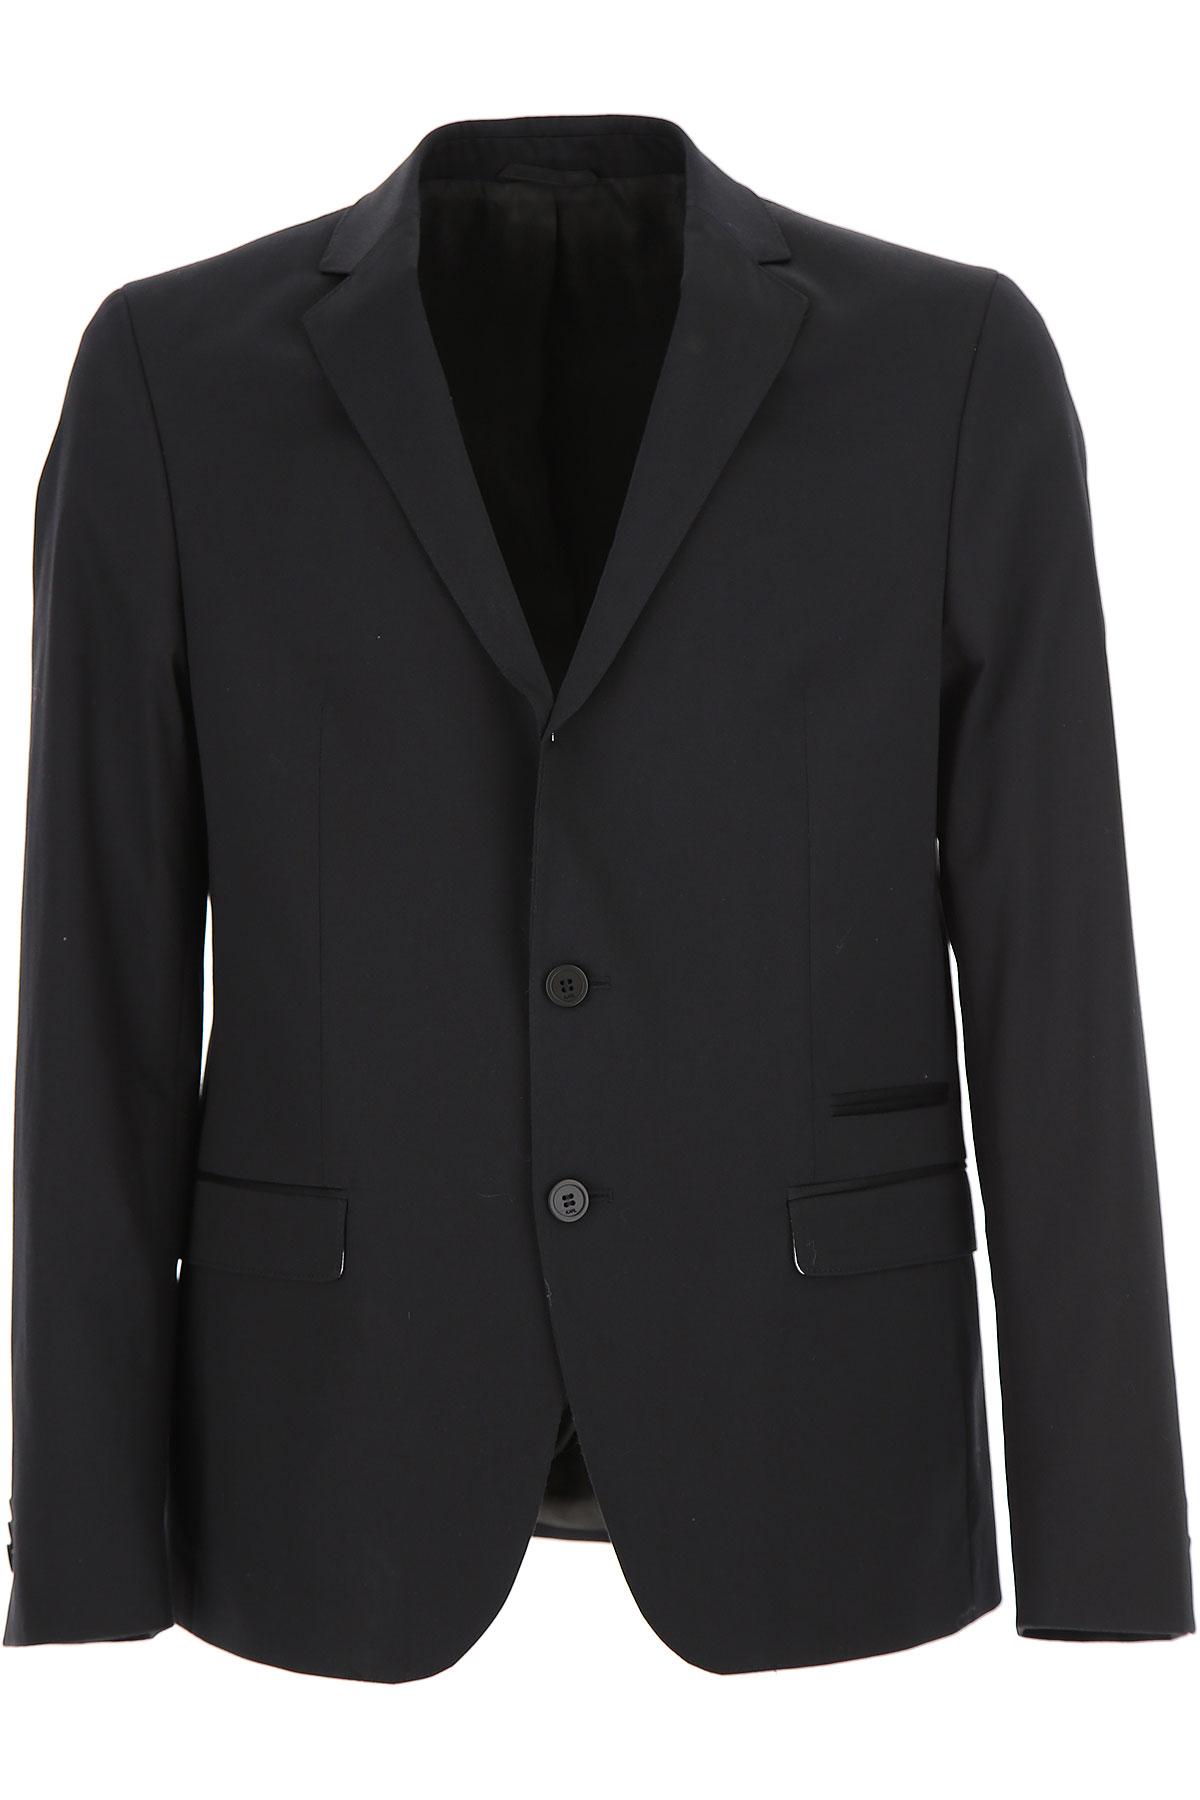 Image of Karl Lagerfeld Blazer for Men, Sport Coat On Sale, Black, Cotton, 2017, L M XL XXL